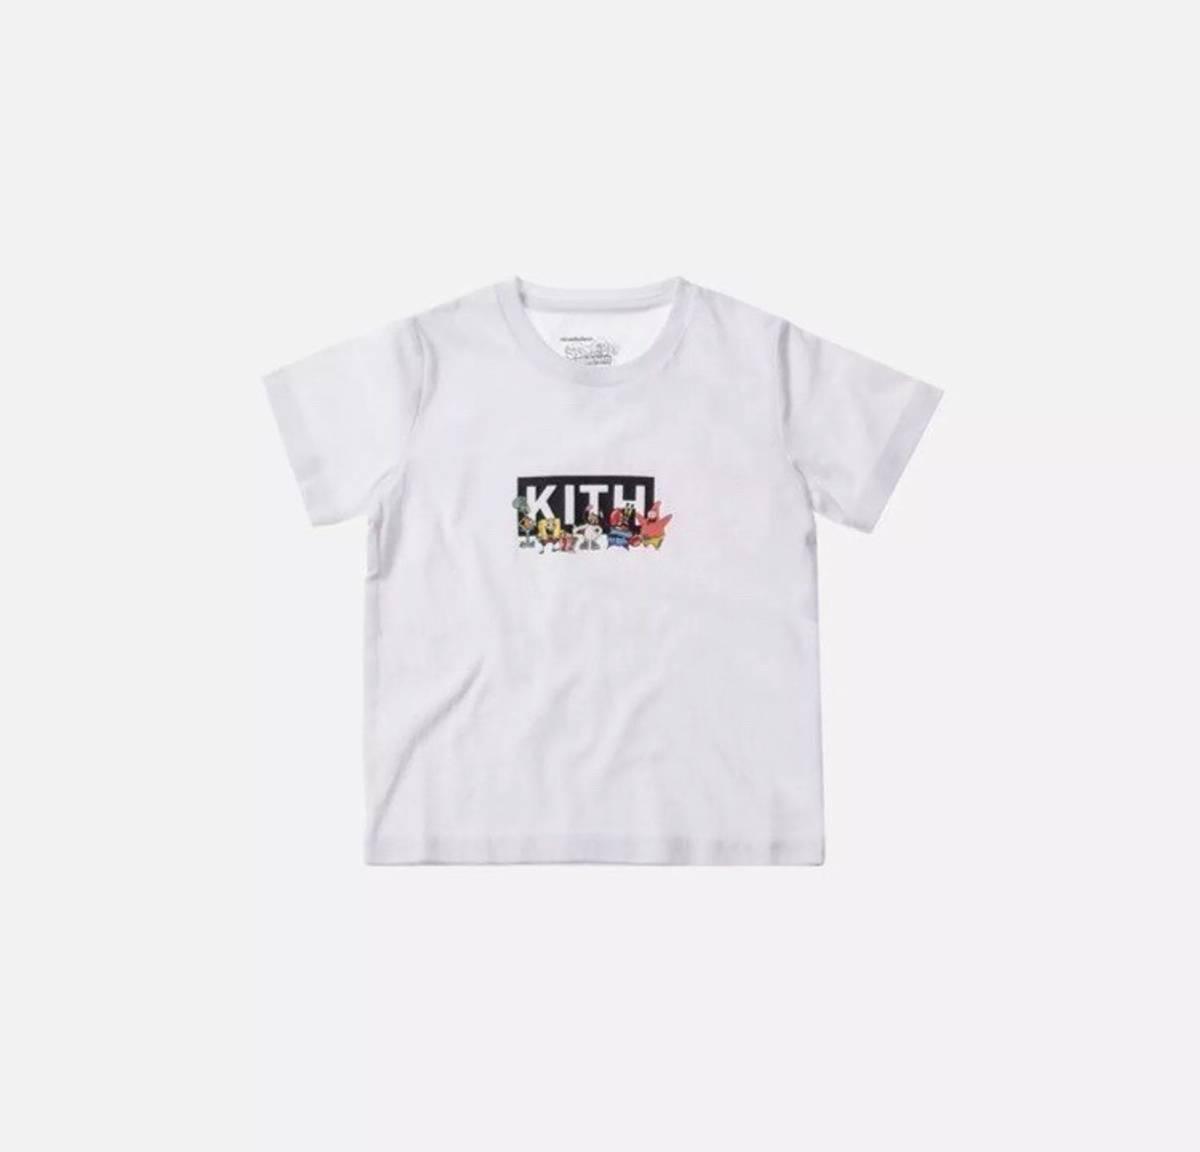 b9d6faed9d2 Kith Nyc Kith Kids X Spongebob Box Logo Tee Kids Size m - Short ...